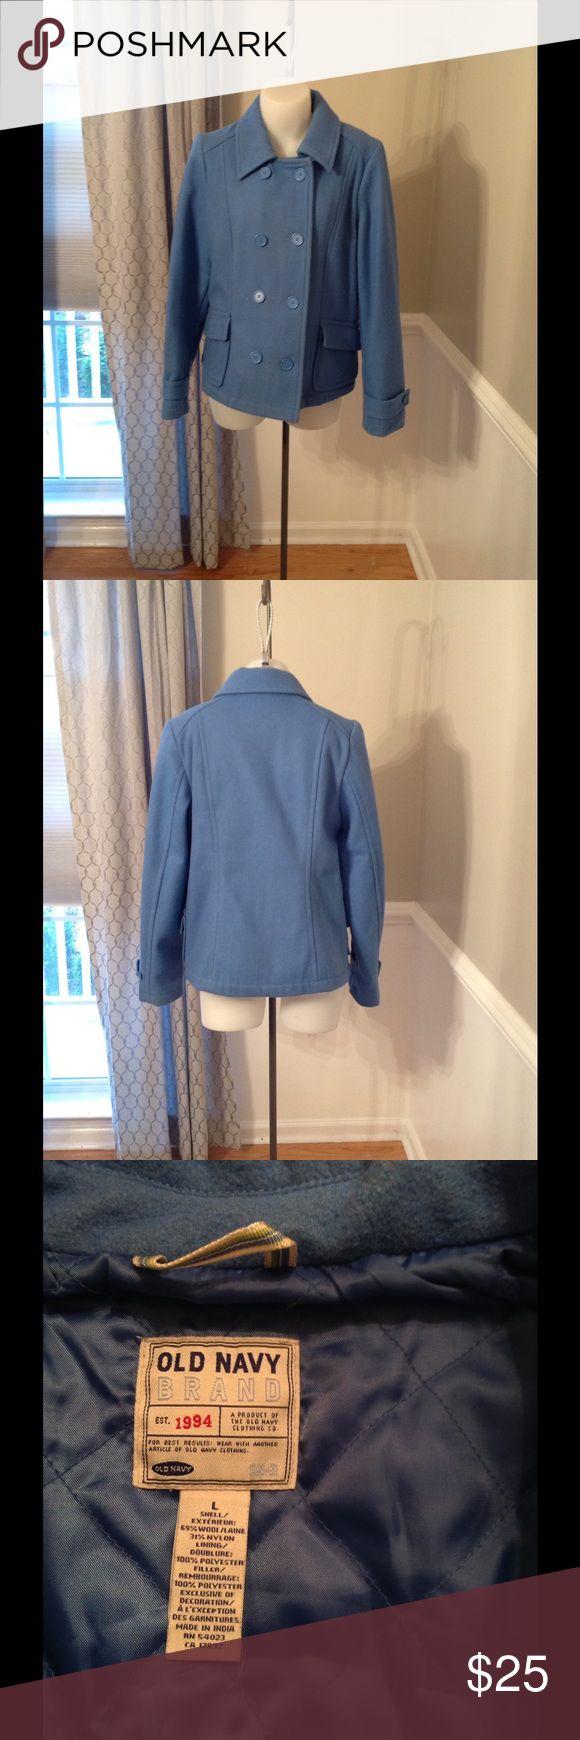 Old Navy Pea Coat Great periwinkle blue pea coat size L Old Navy Jackets & Coats Pea Coats